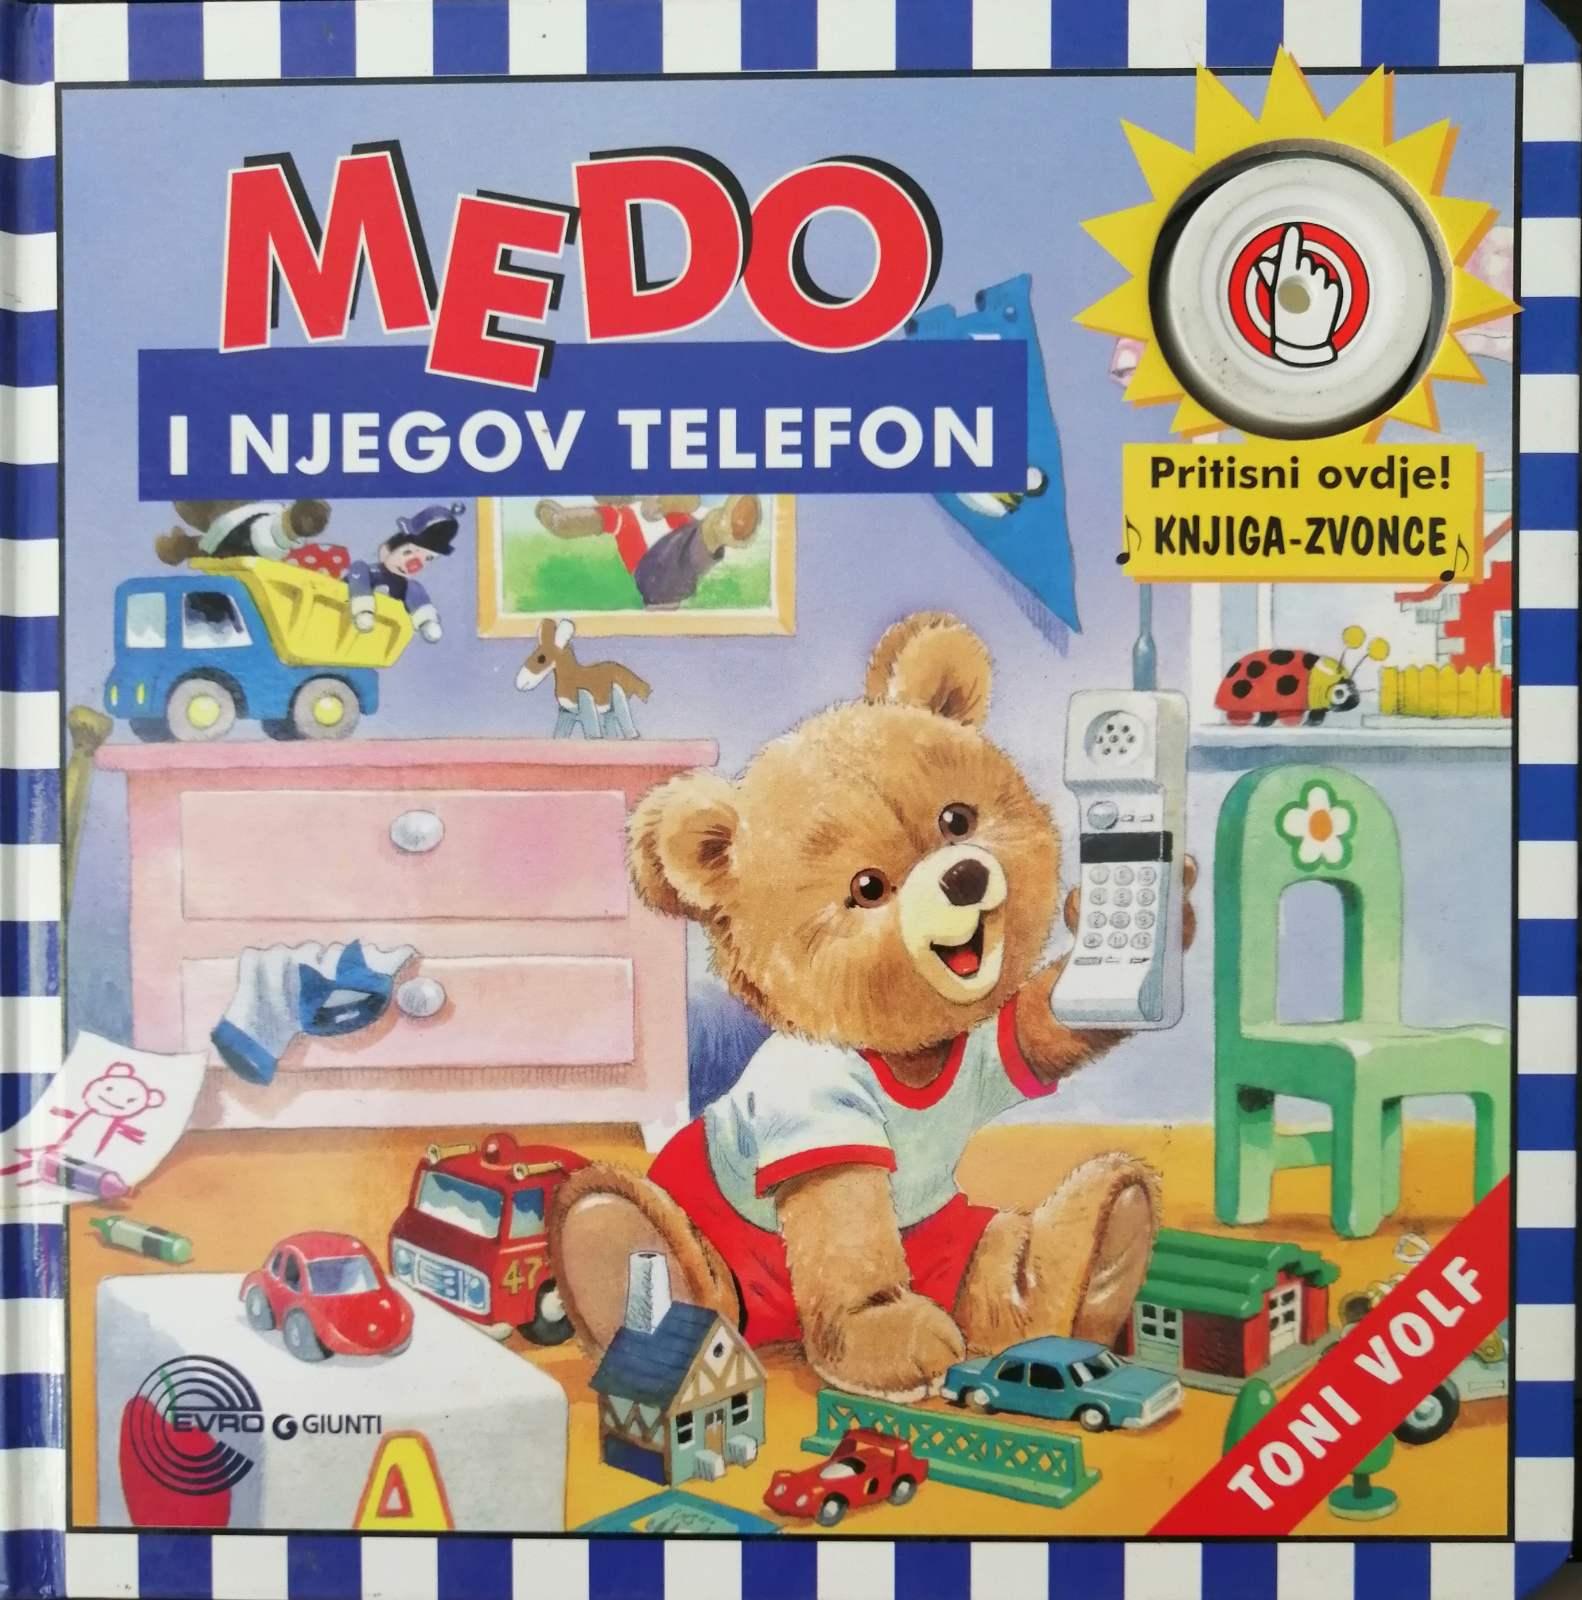 MEDO I NJEGOV TELEFON – OŠTEĆENO